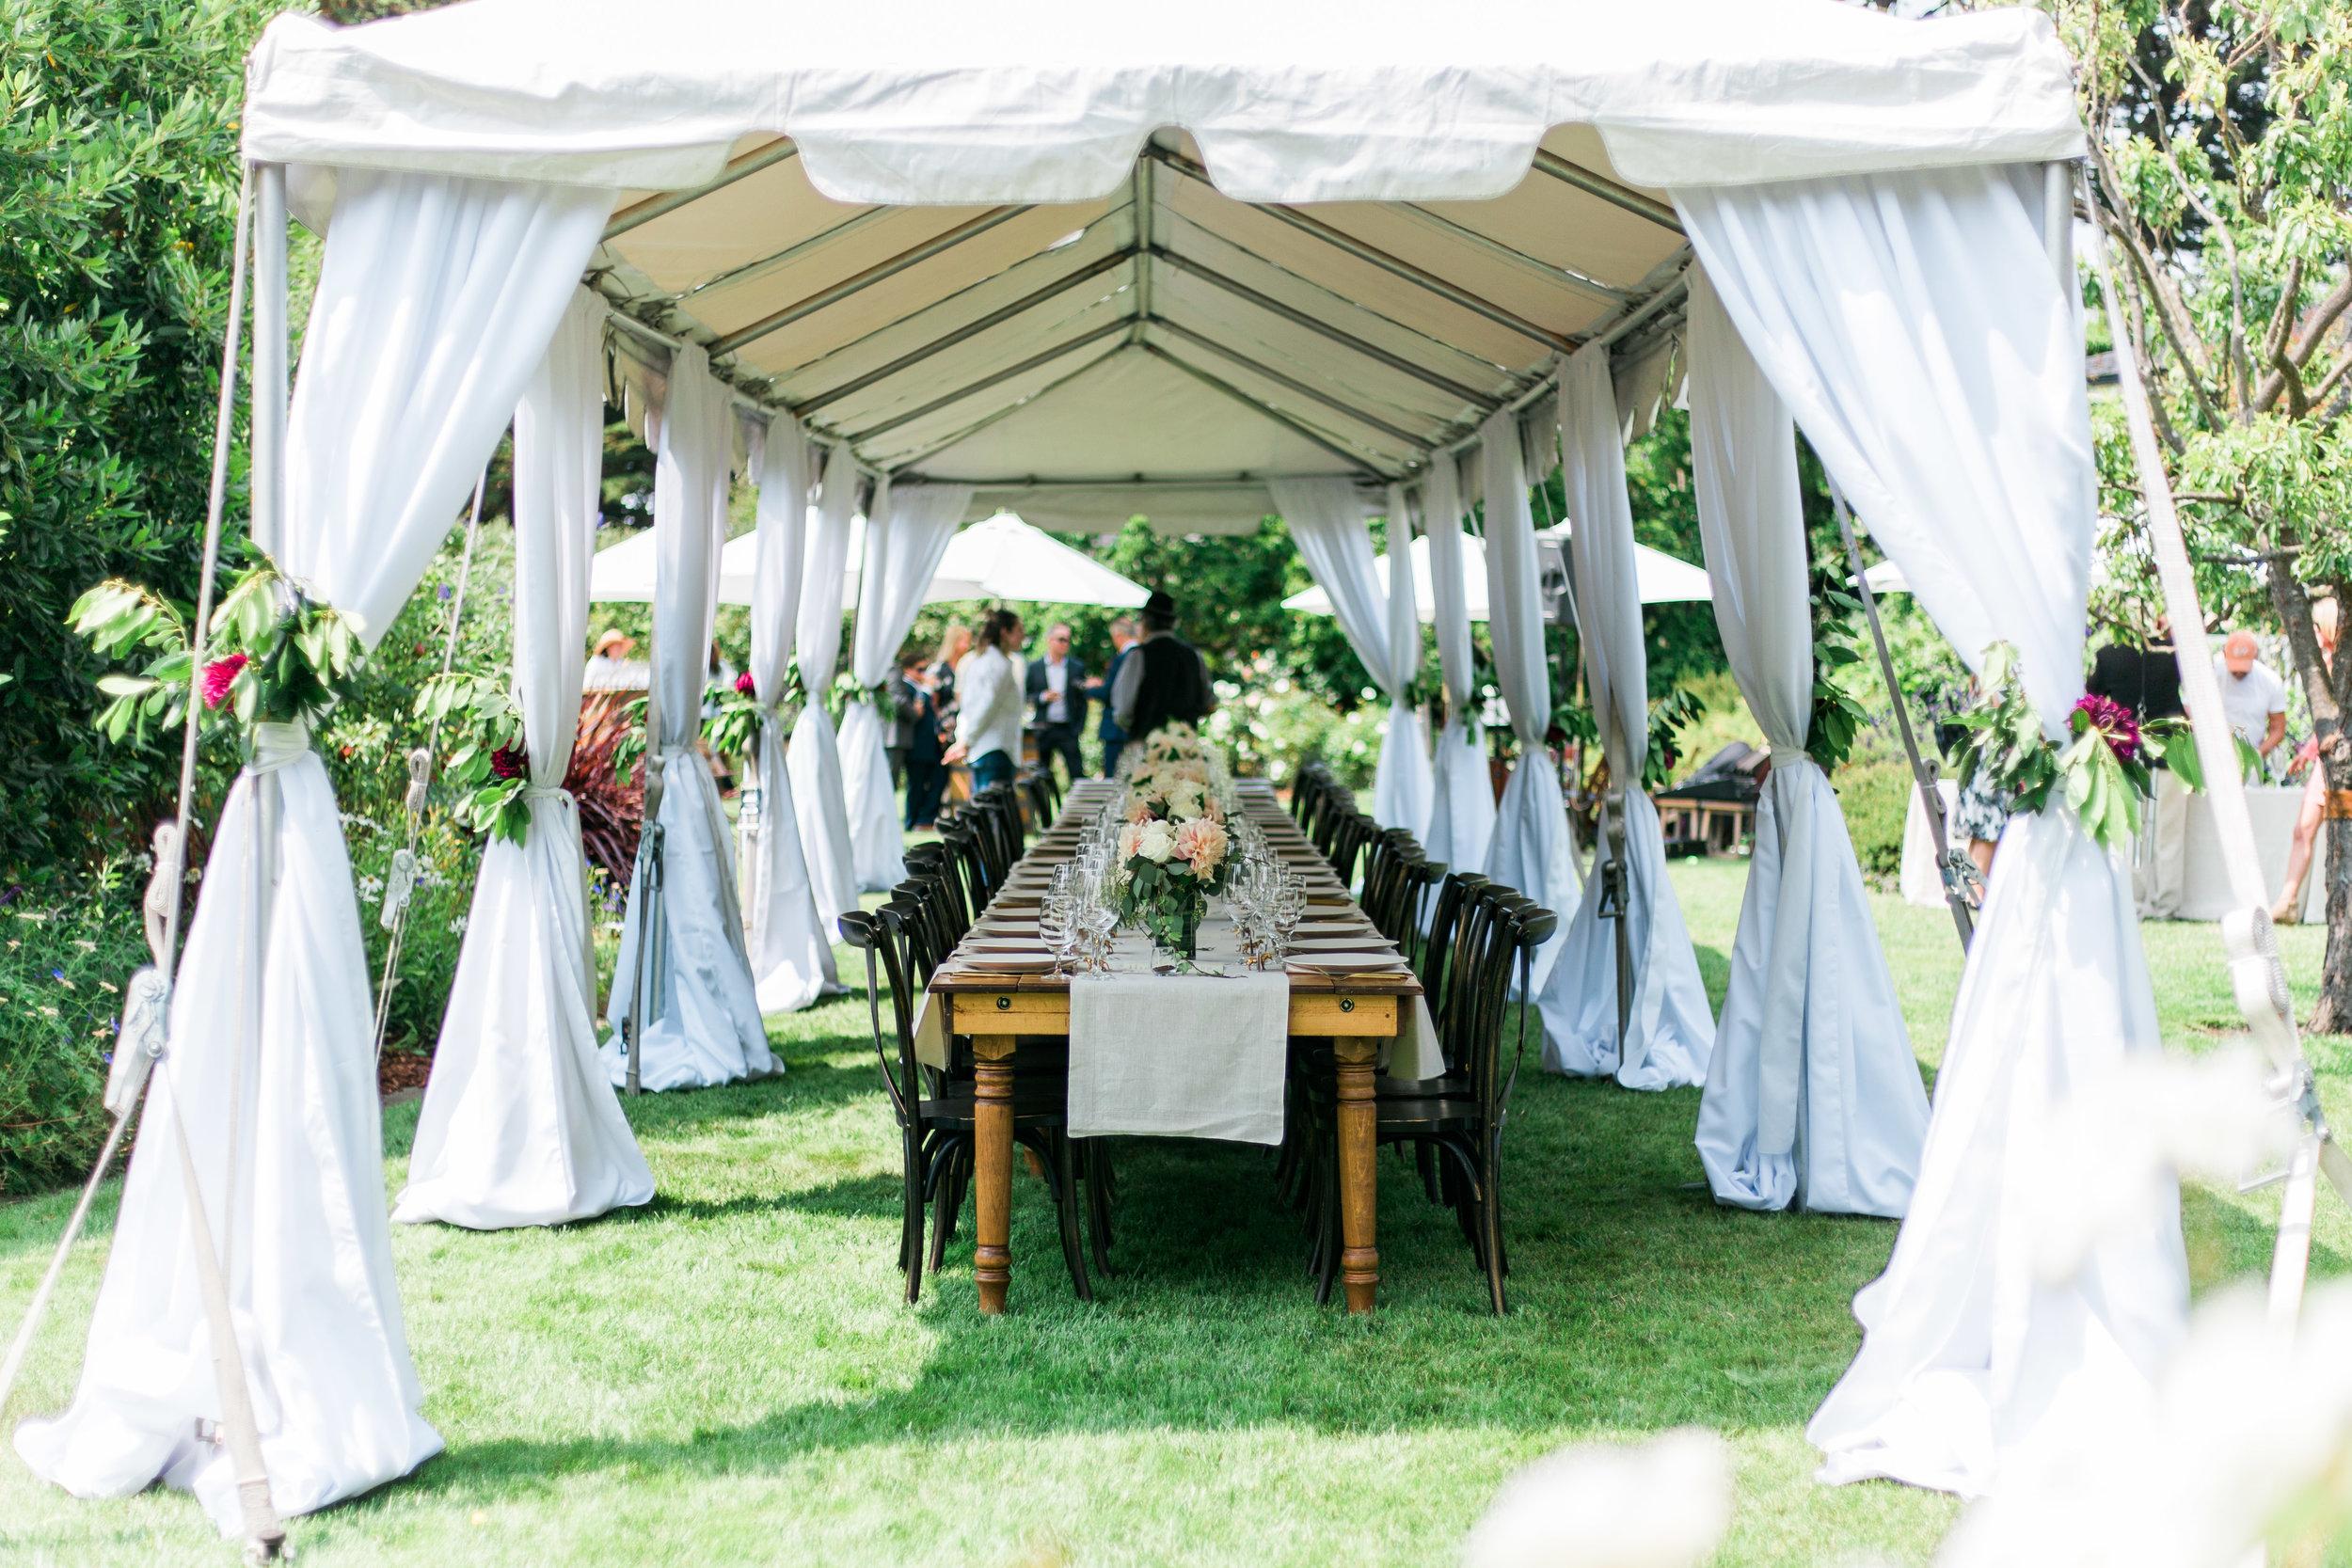 Holly-Nicholas-Wedding-by-JBJ-Pictures-5.jpg